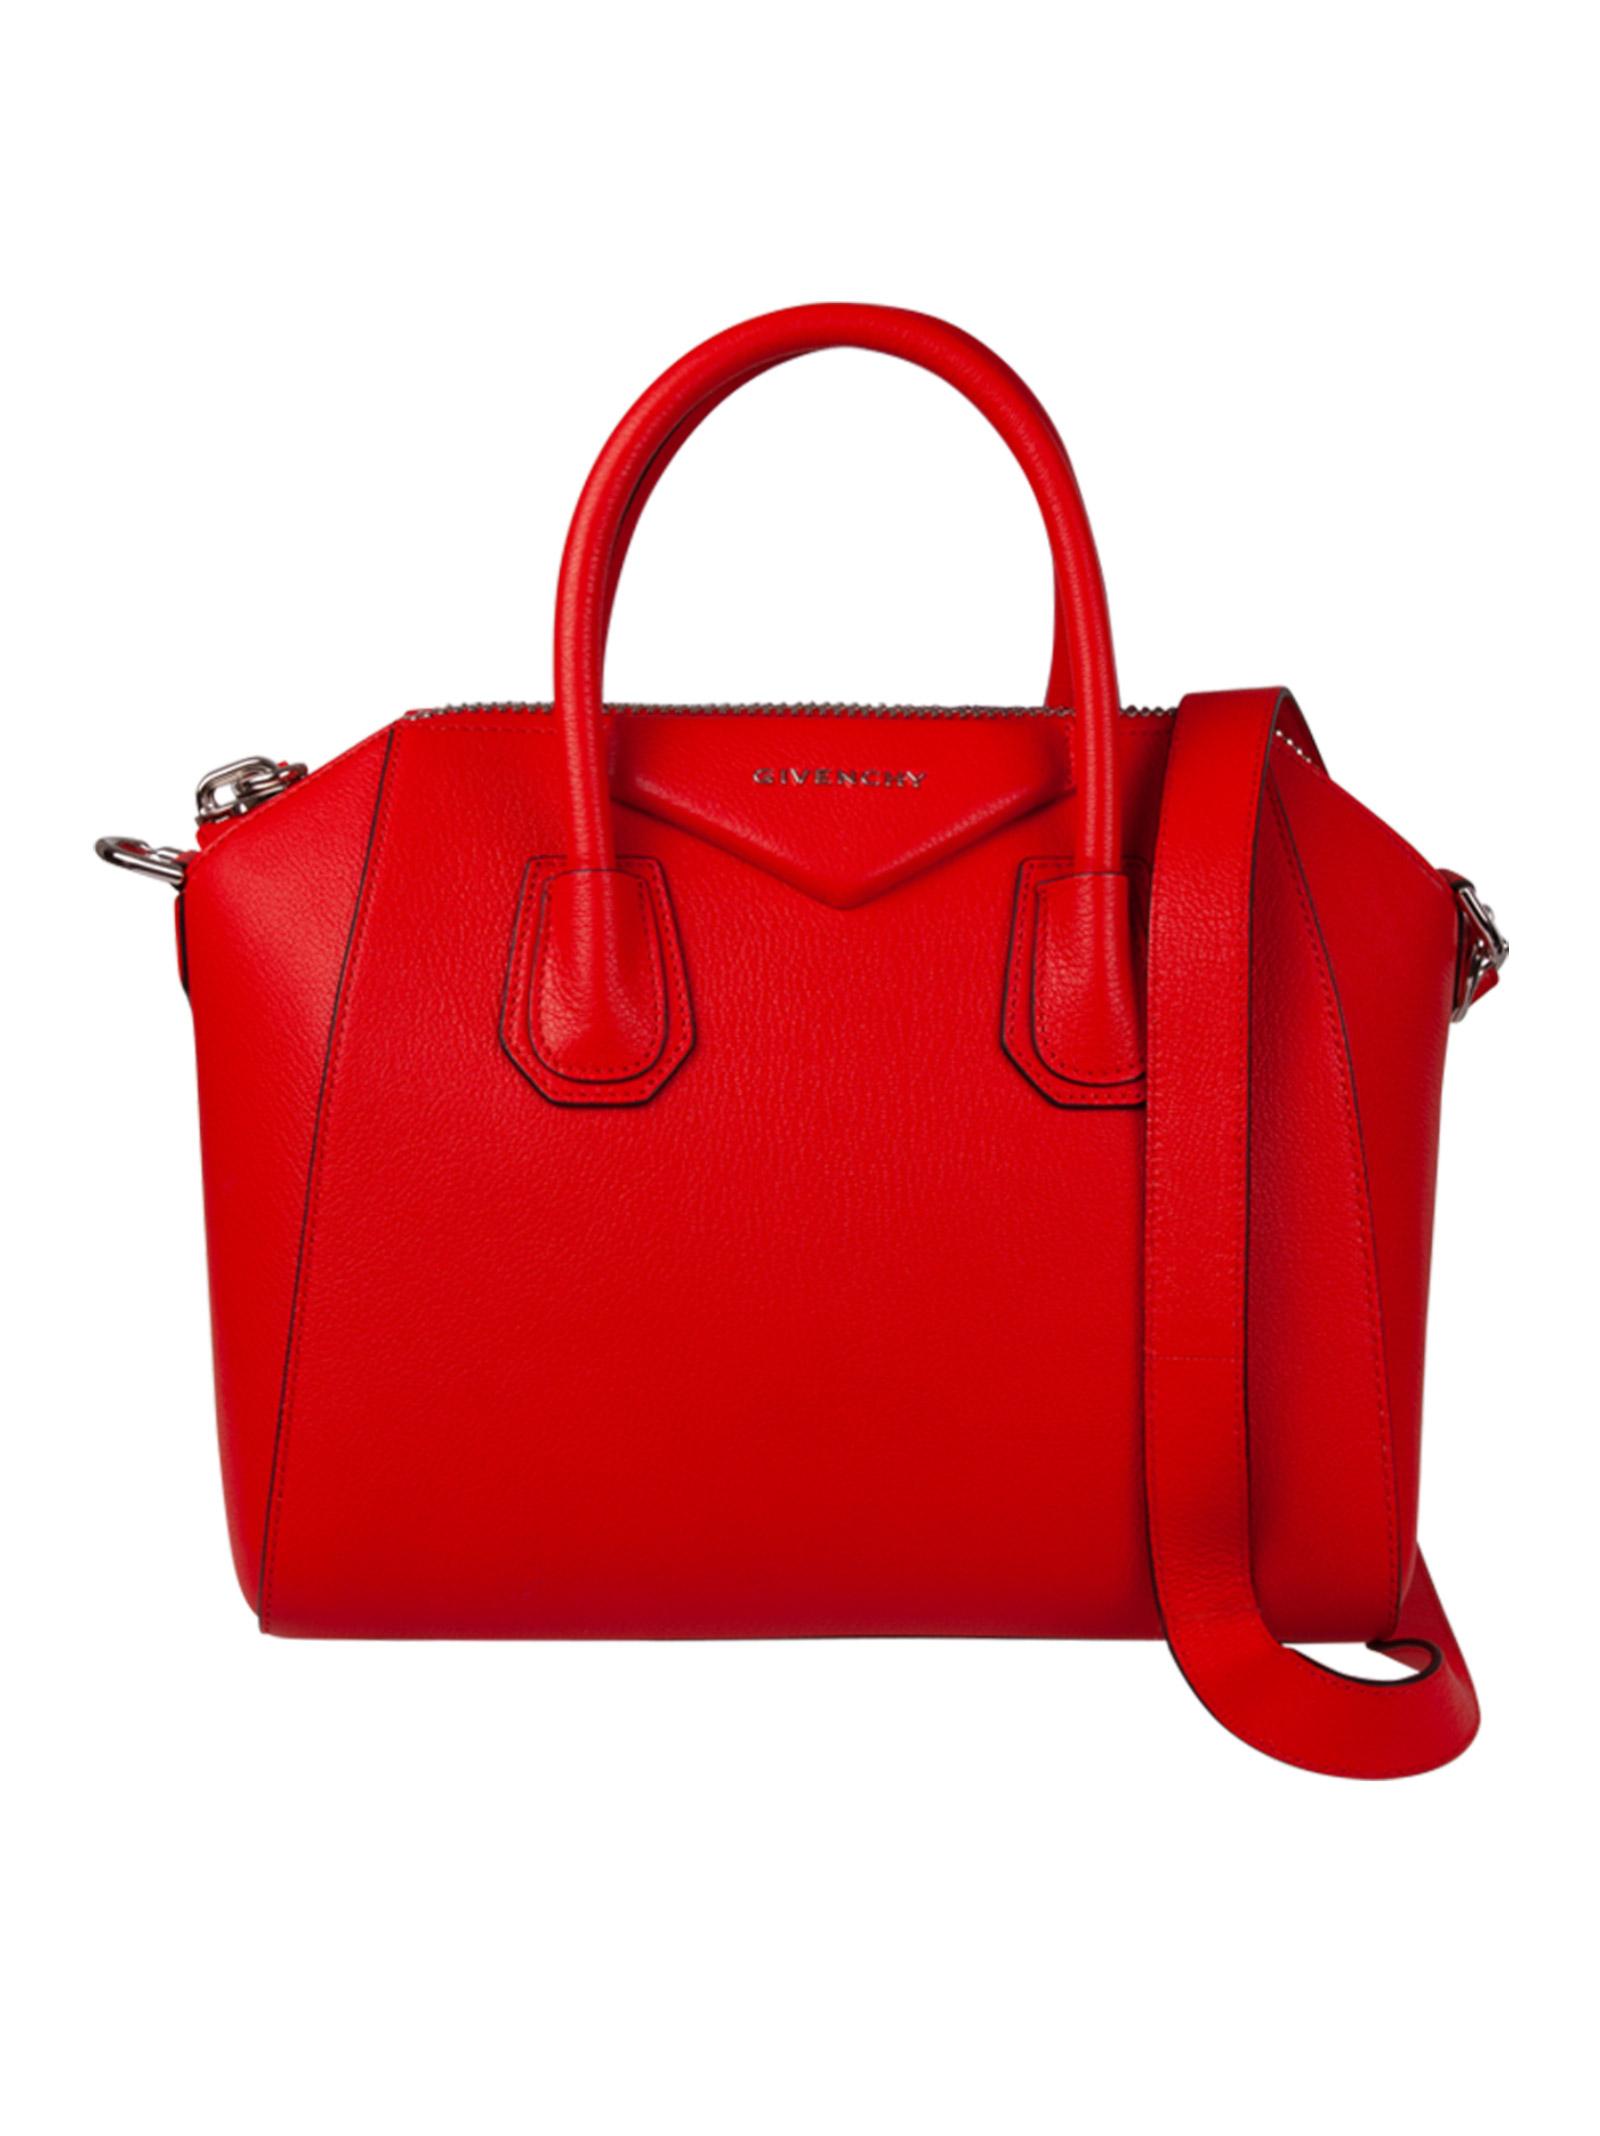 Givenhcy tote bag - Givenchy - Michele Franzese Moda 1fae8554c2042